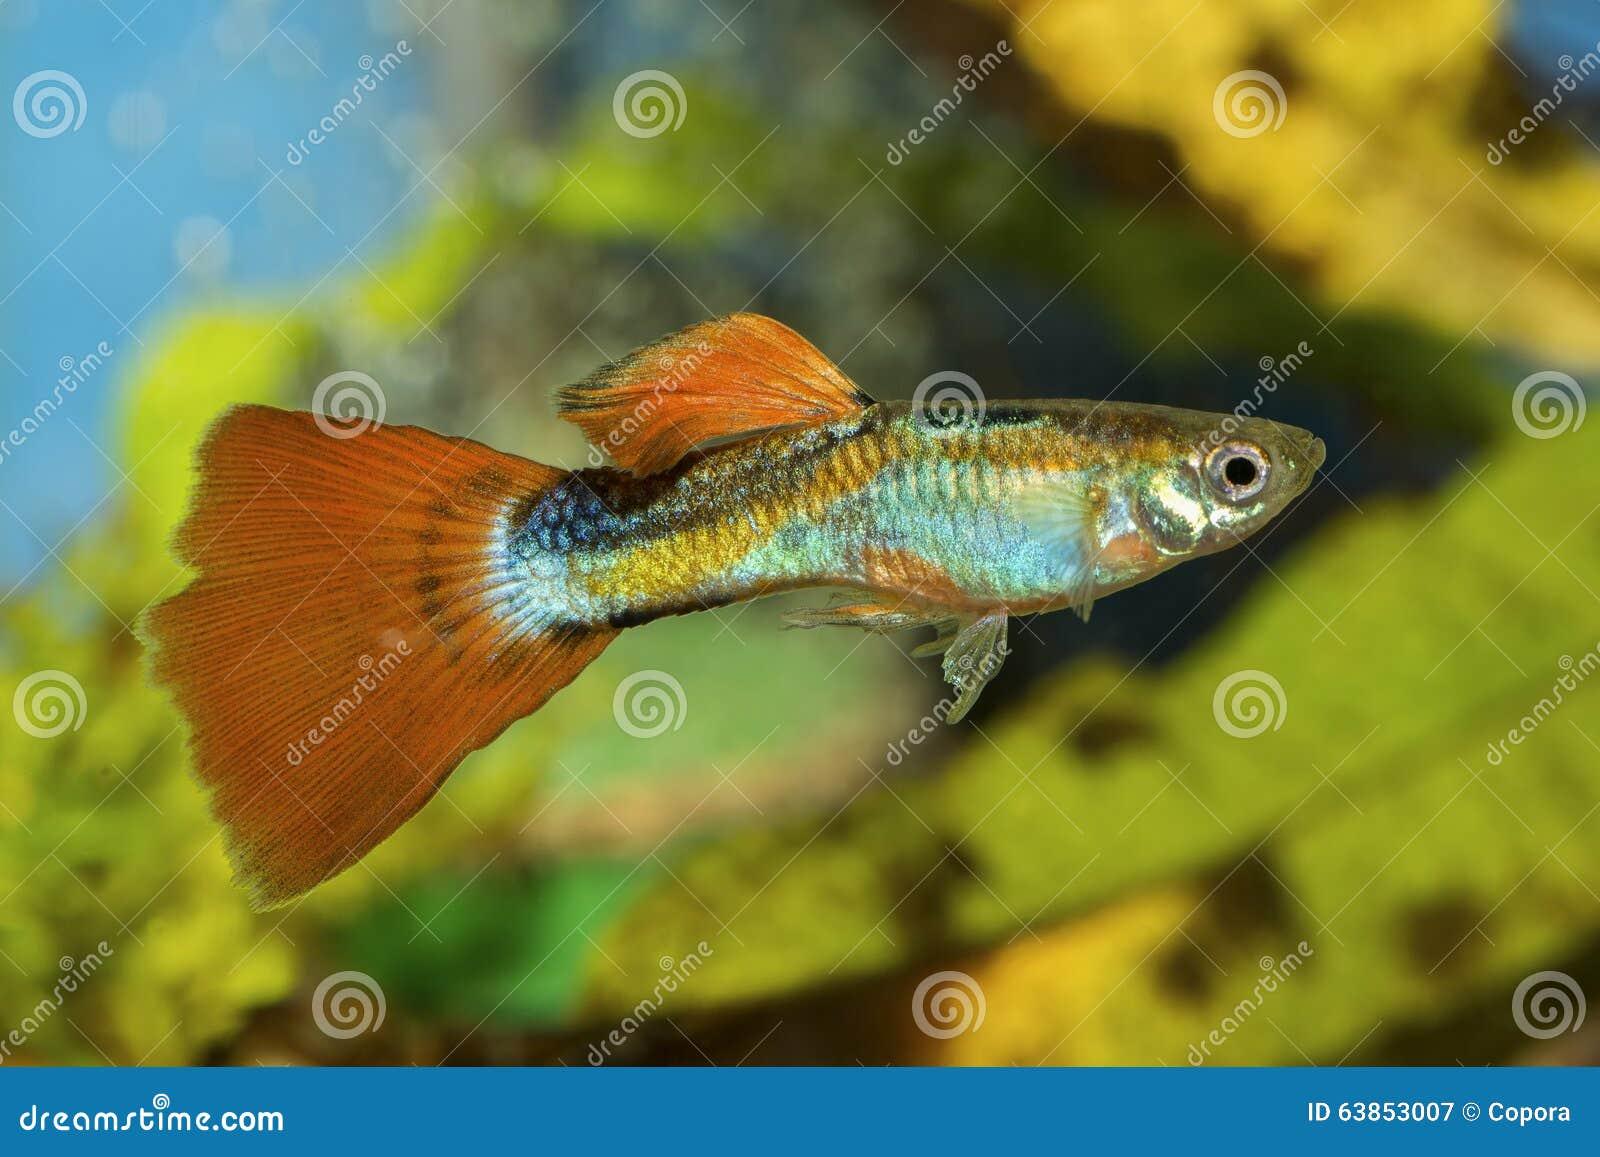 Guppy fish in a aquarium